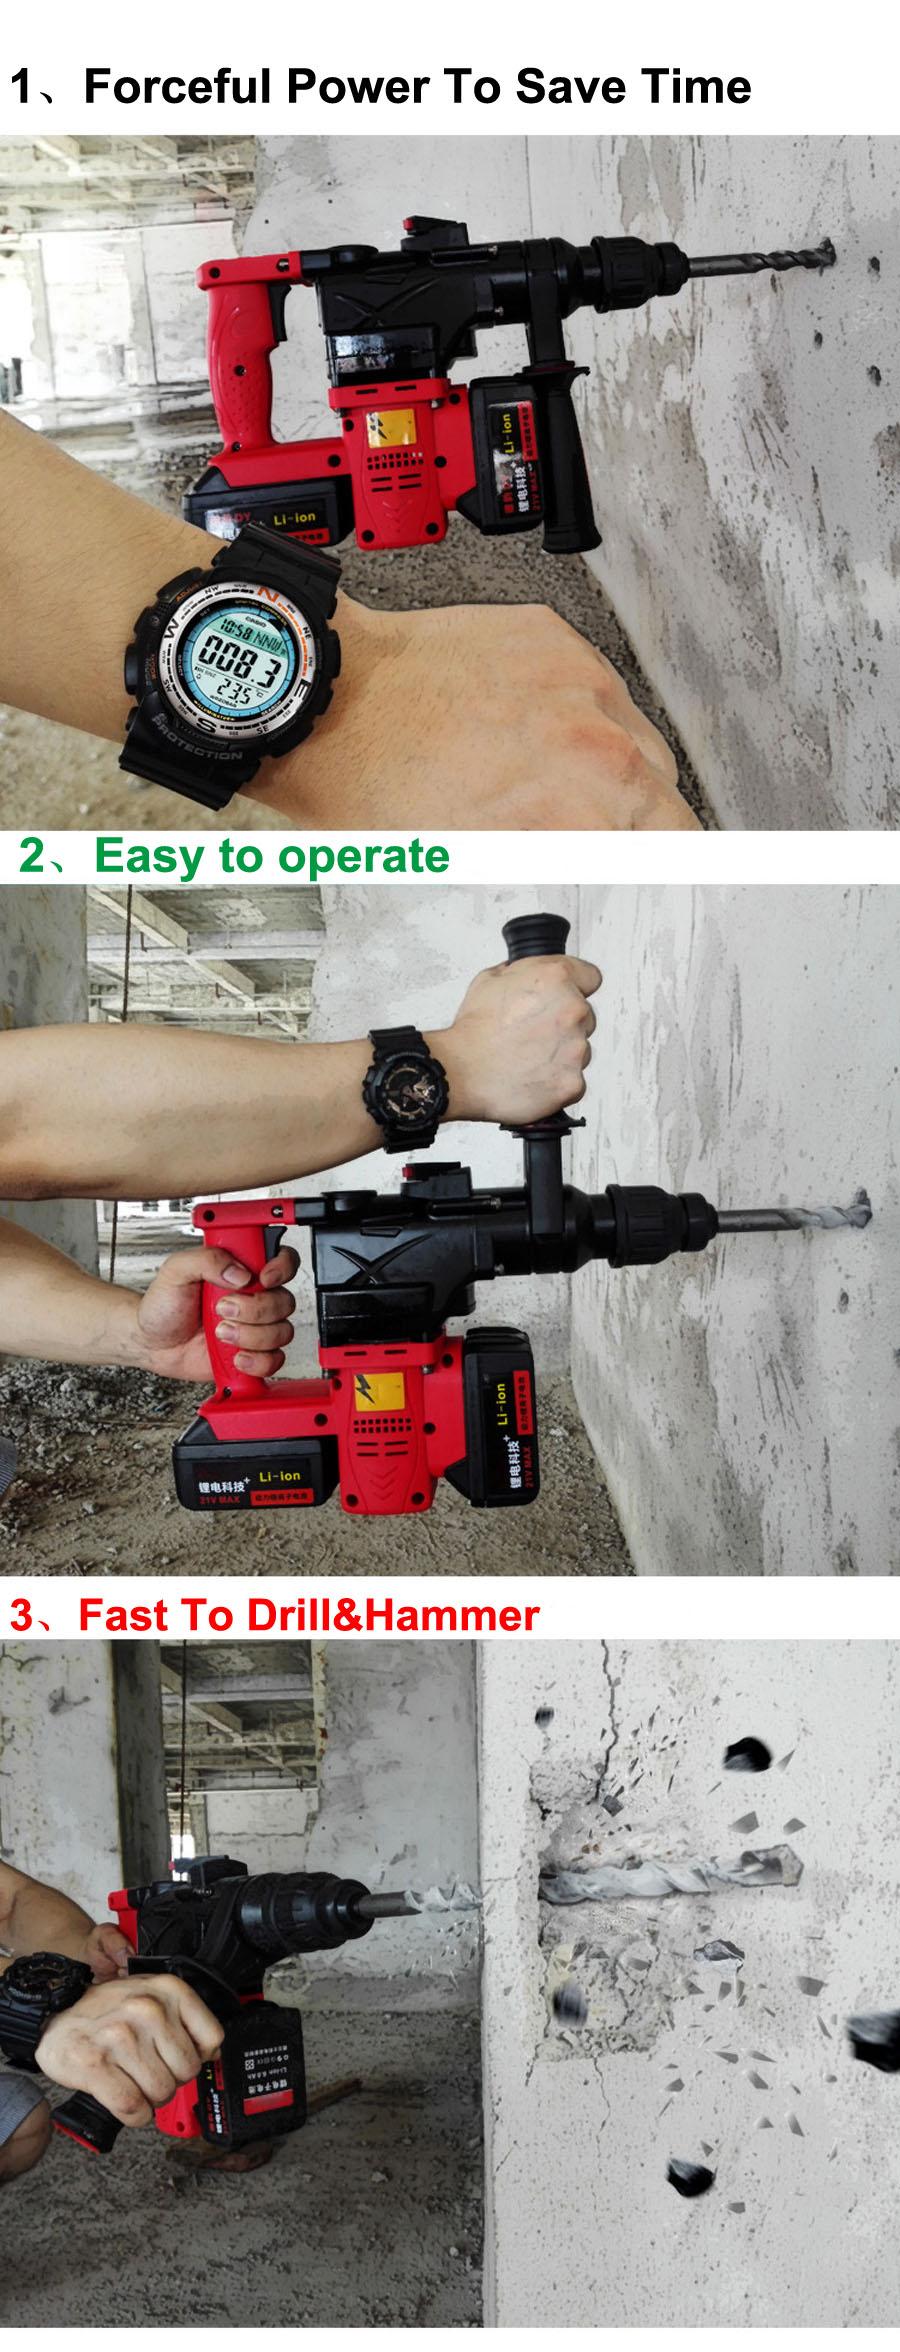 HTB1n7 JaoFWMKJjSZFvq6yenFXaZ - 15000 25000mAh Heavy Industrial Wall Hammer Cordless Drill Rechargeable Samsung Lithium Battery Electric Hammer Impact Drill